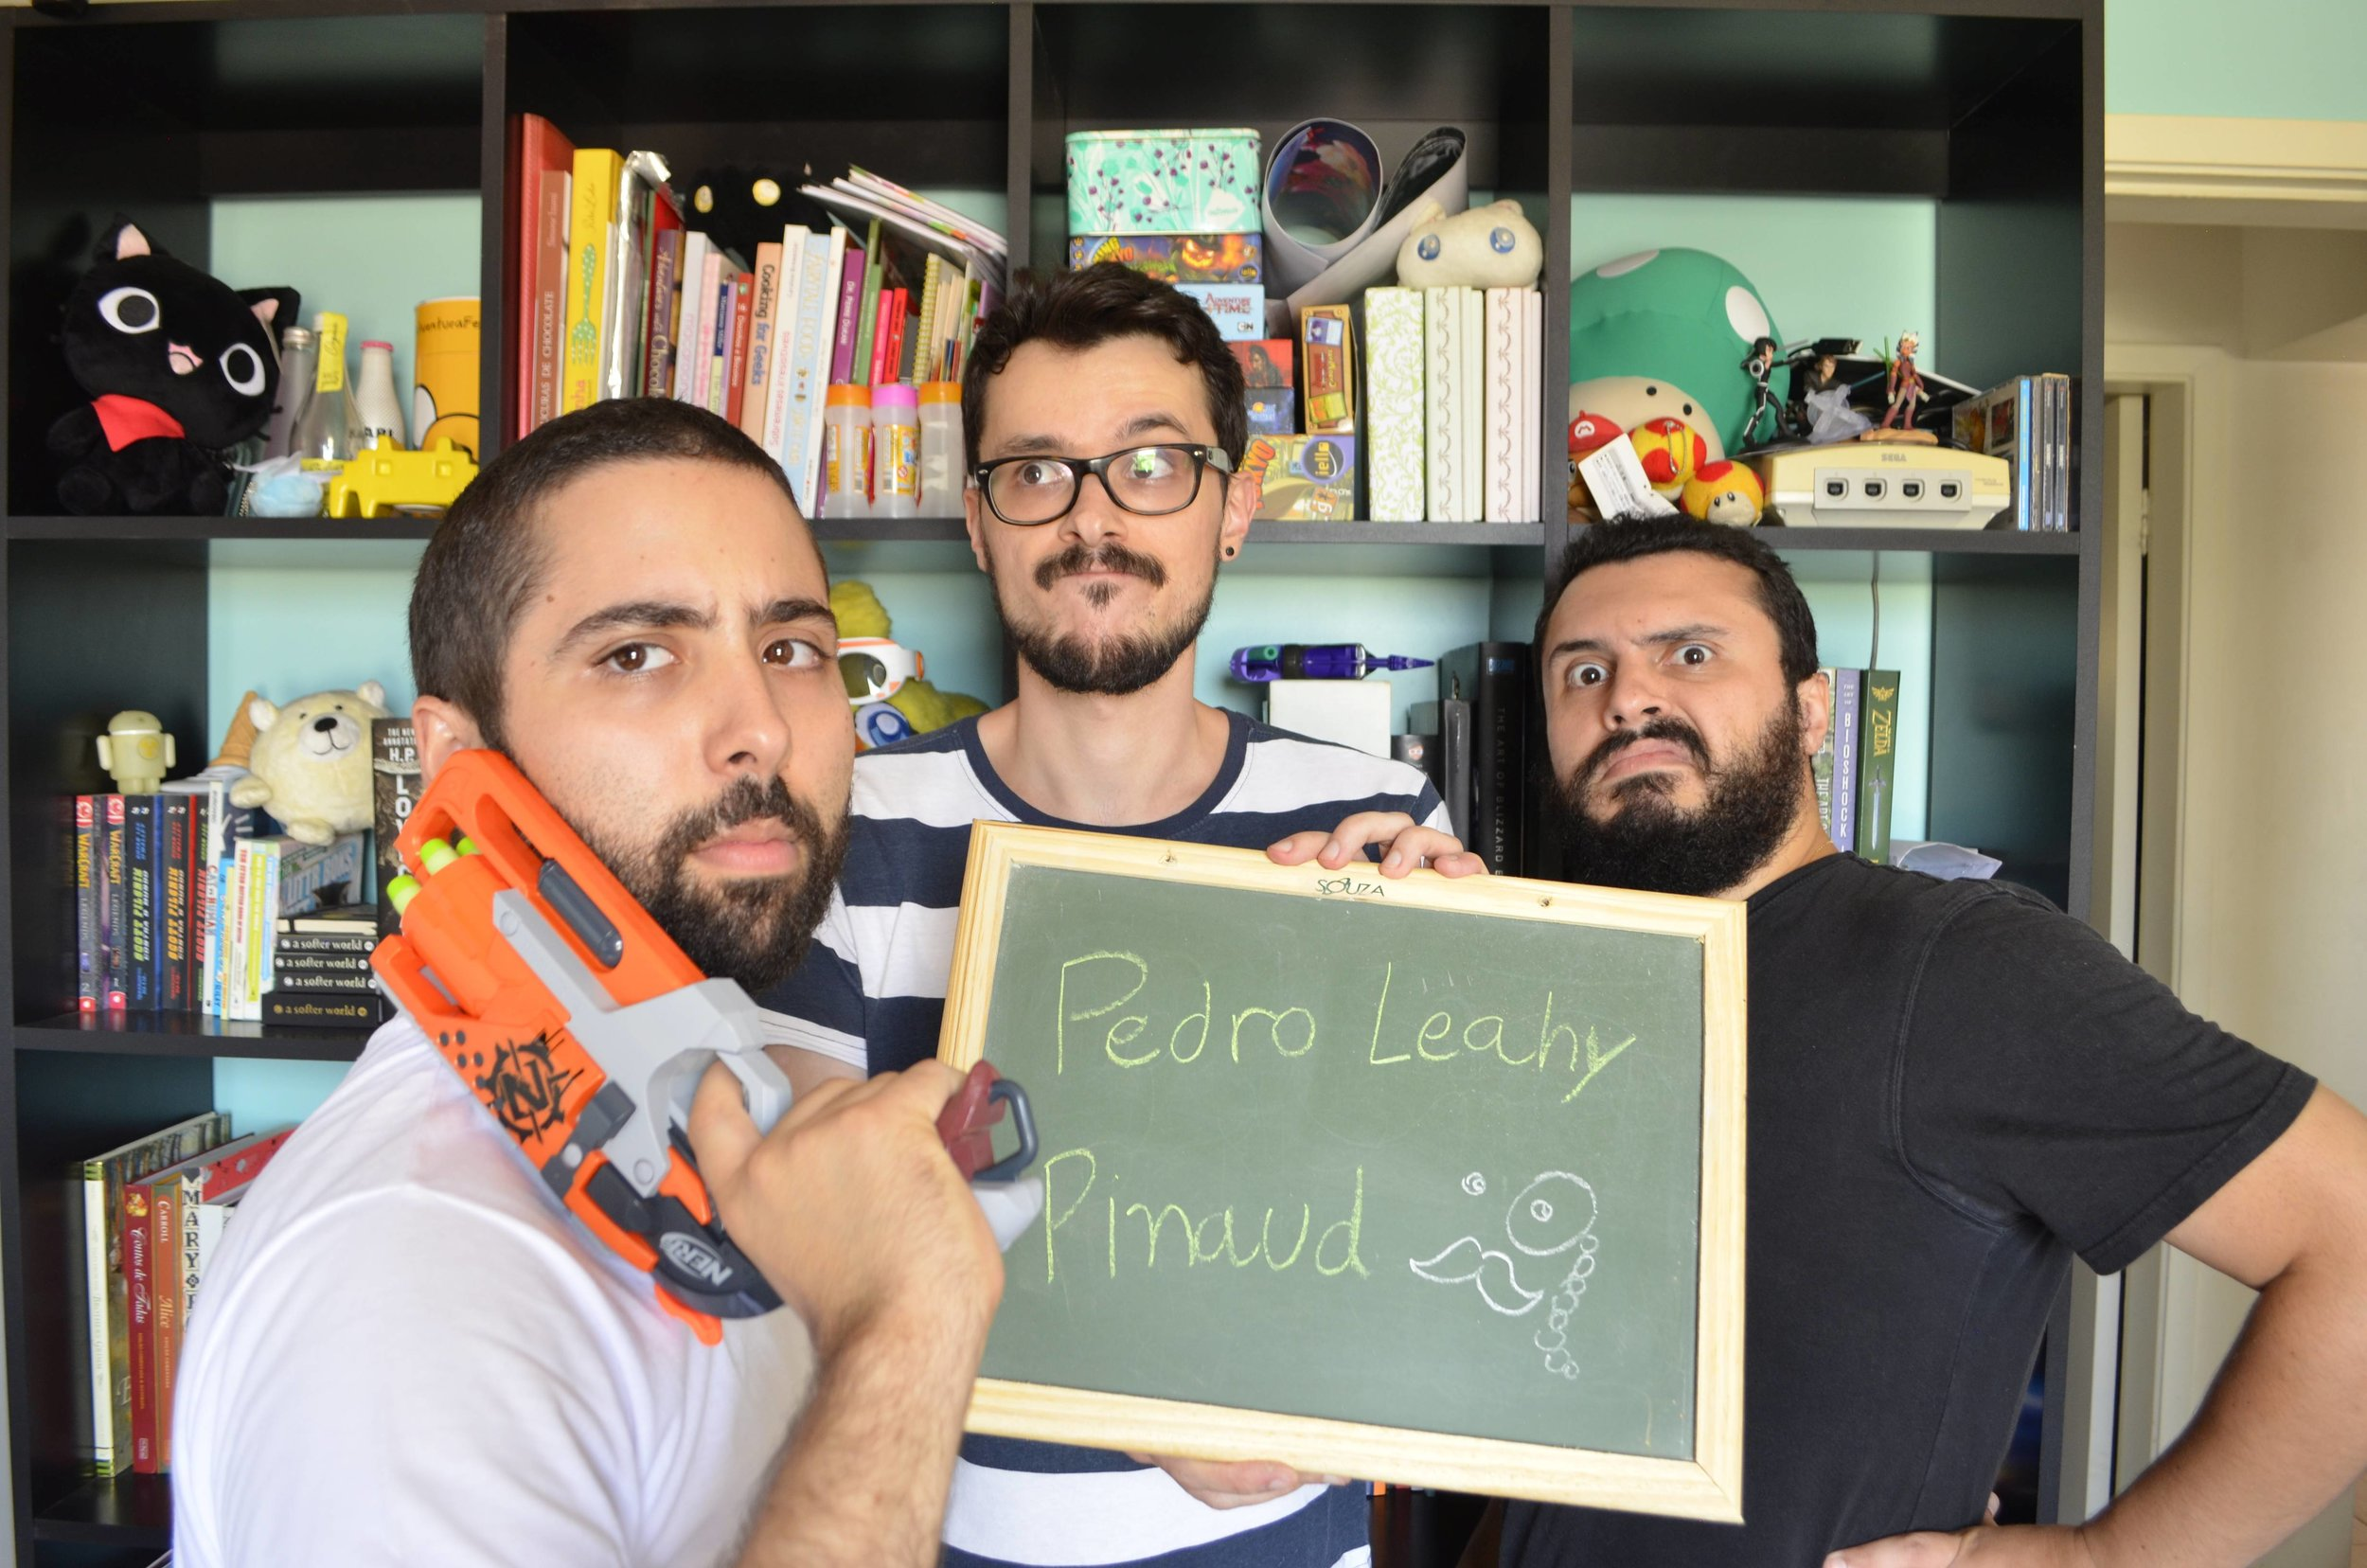 Pedro-Leahy.jpg